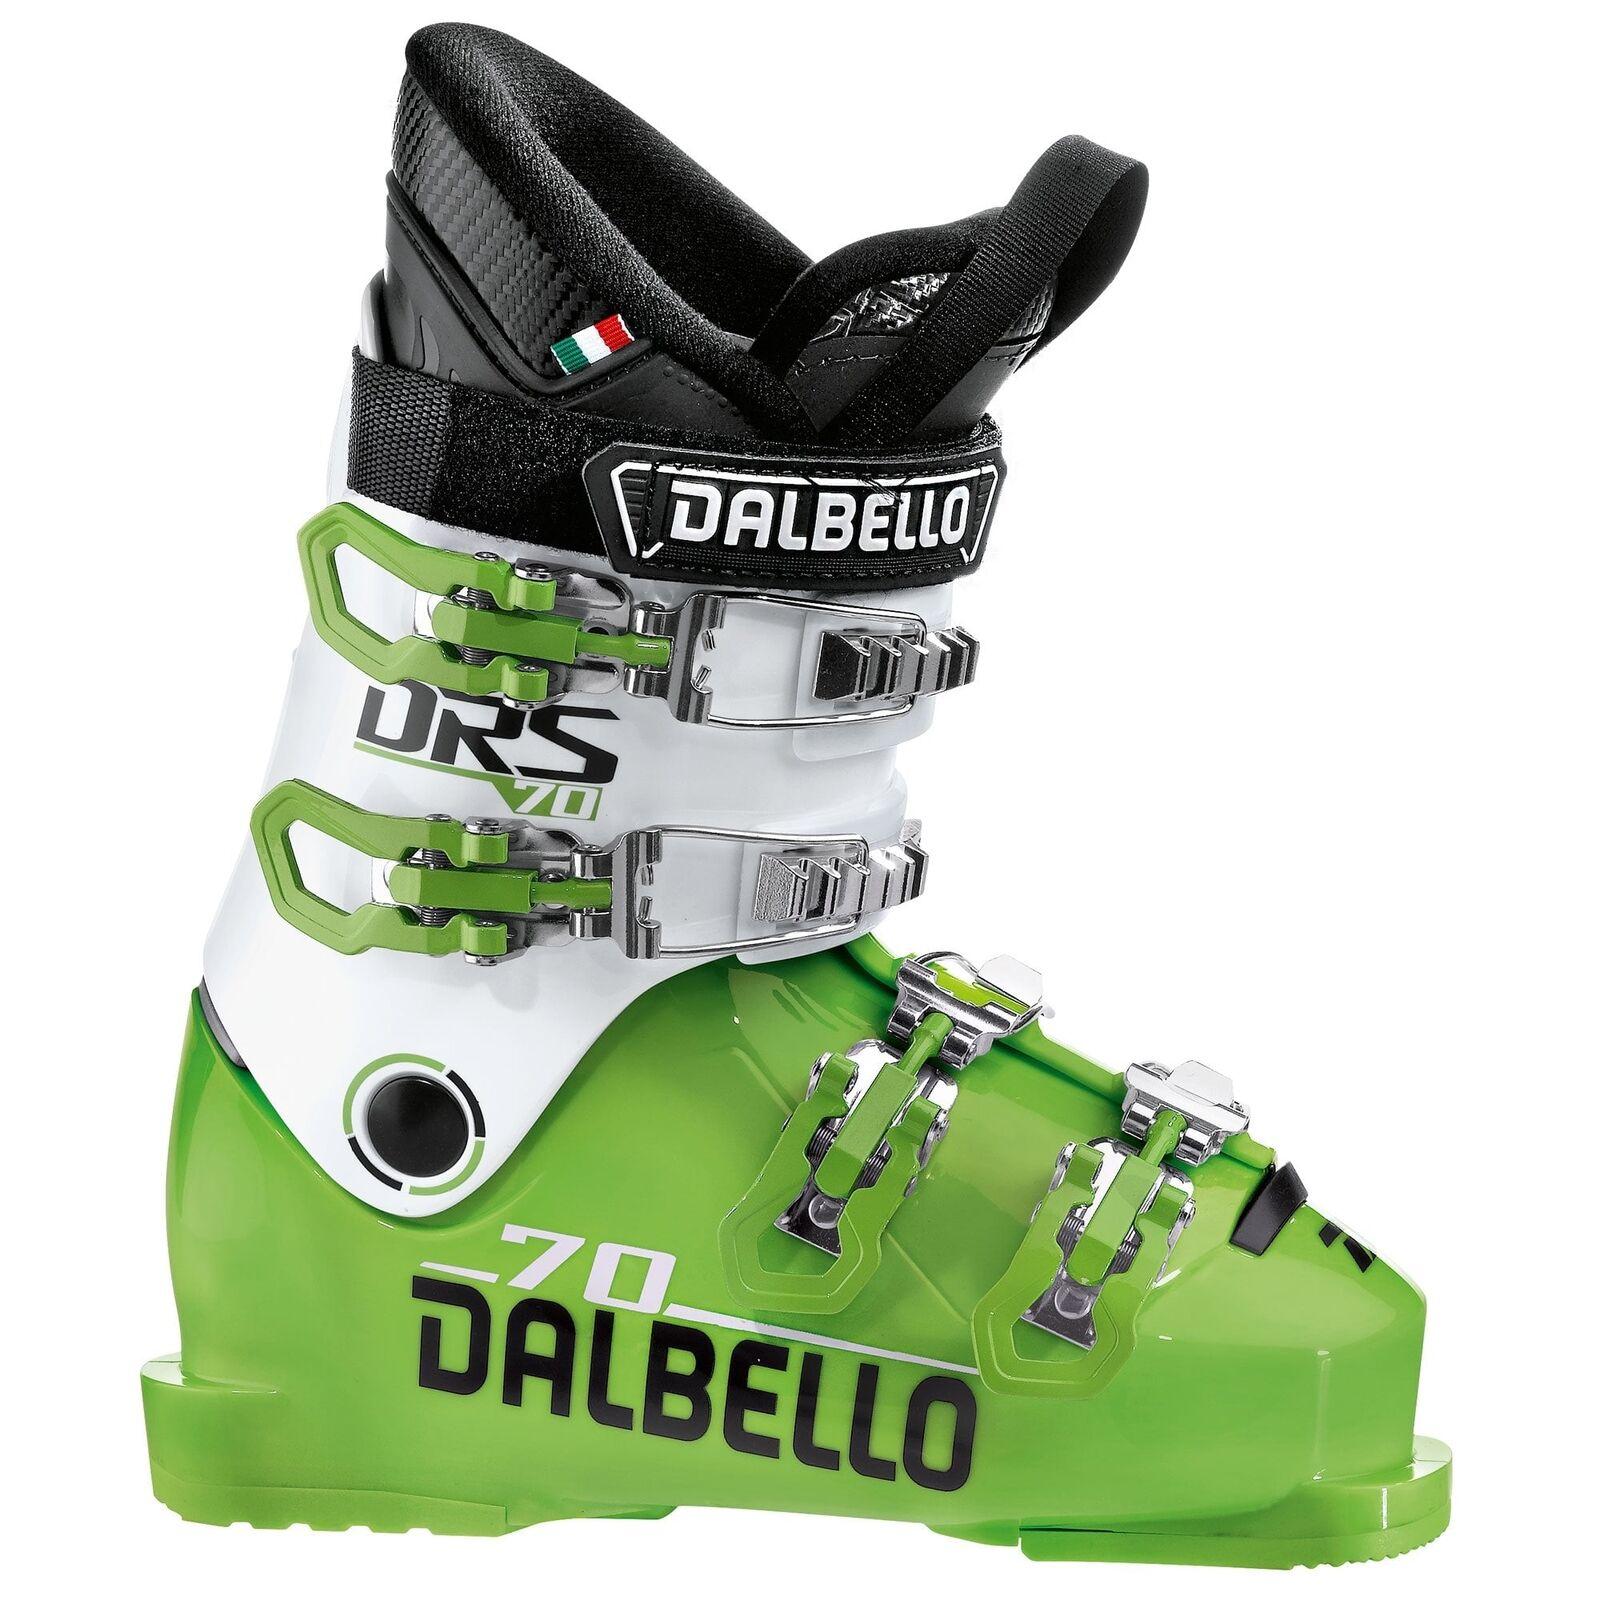 Dalbello DRS 70 Junior Race Ski Boot